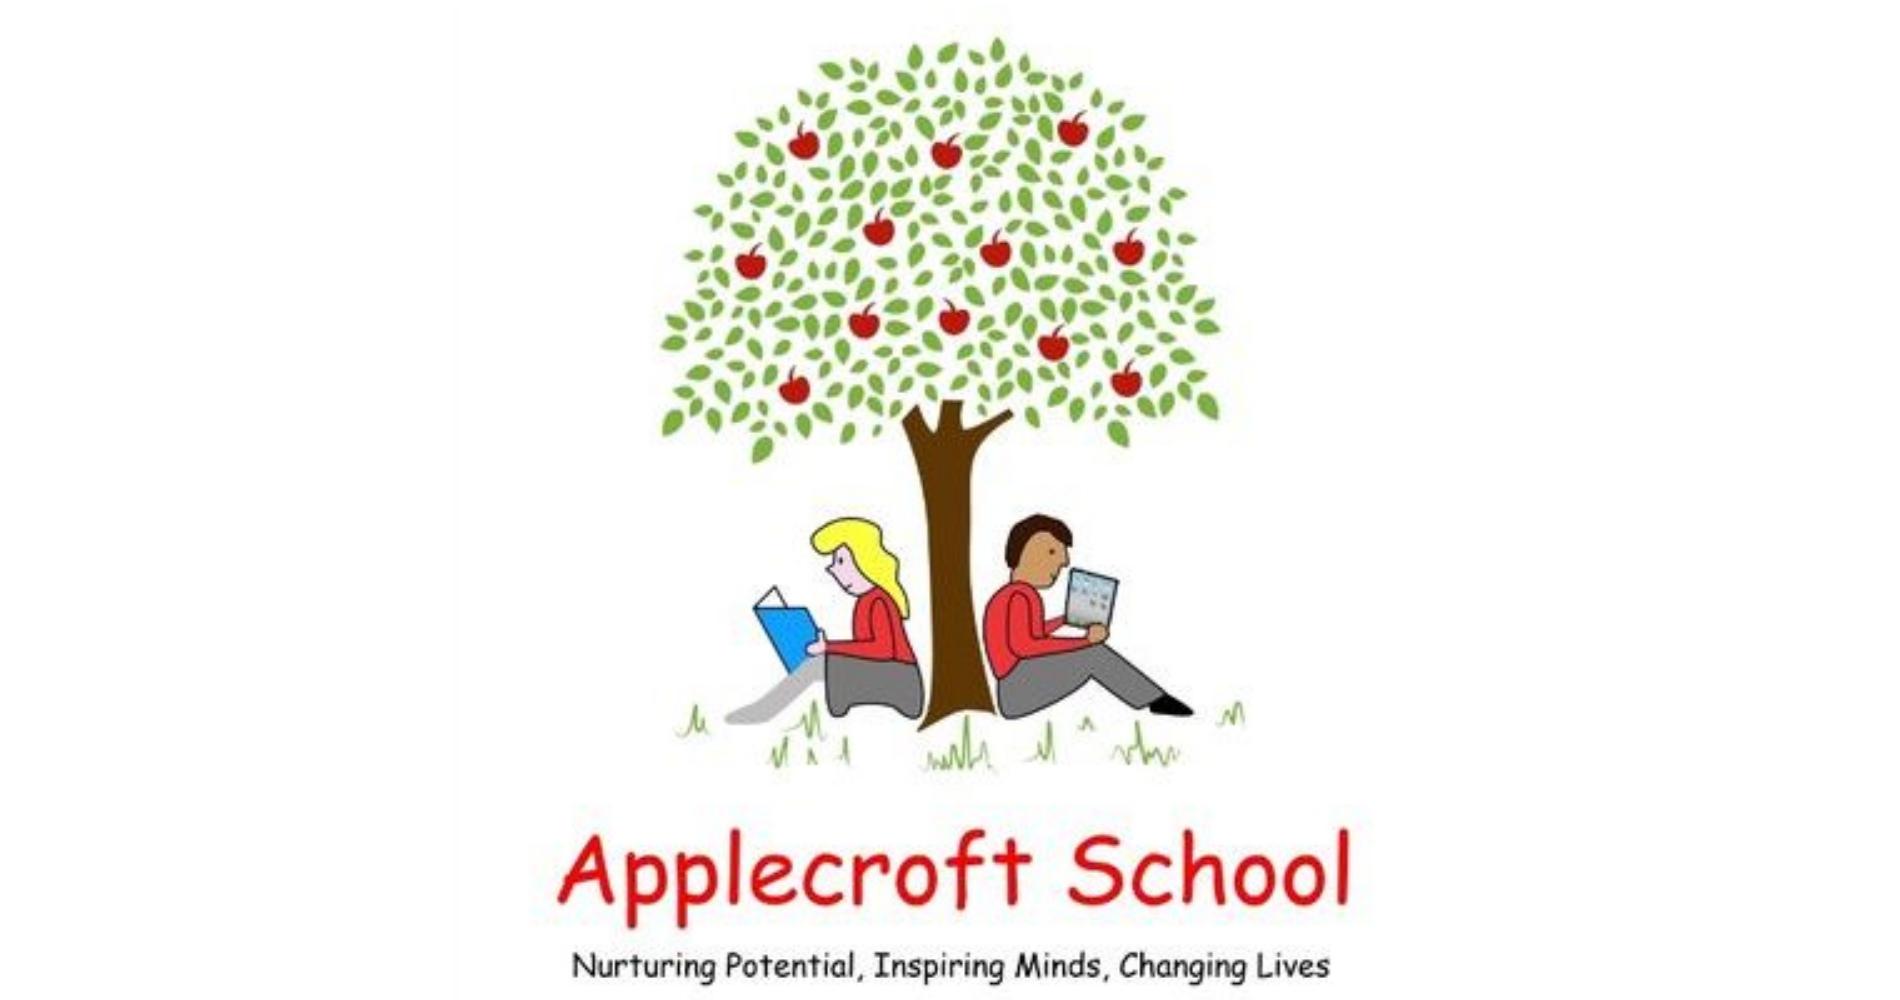 Applecroft School